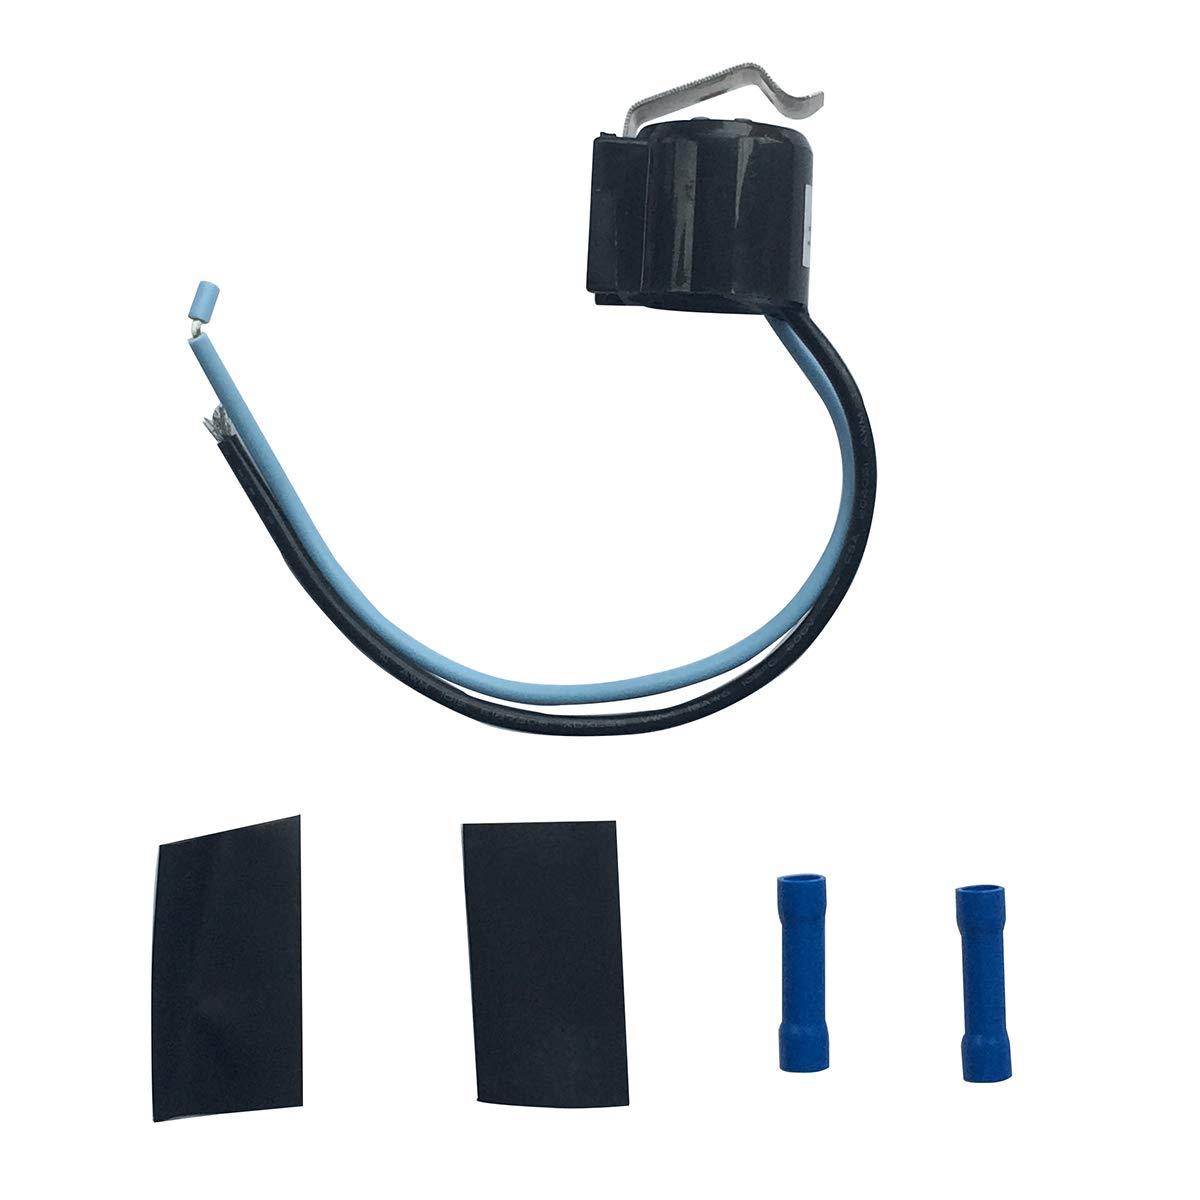 LONYE 5303918214 Refrigerator Defrost Thermostat kit for Frigidaire Kenmore Electrolux fridges AP2150145 PS469522 75303918214